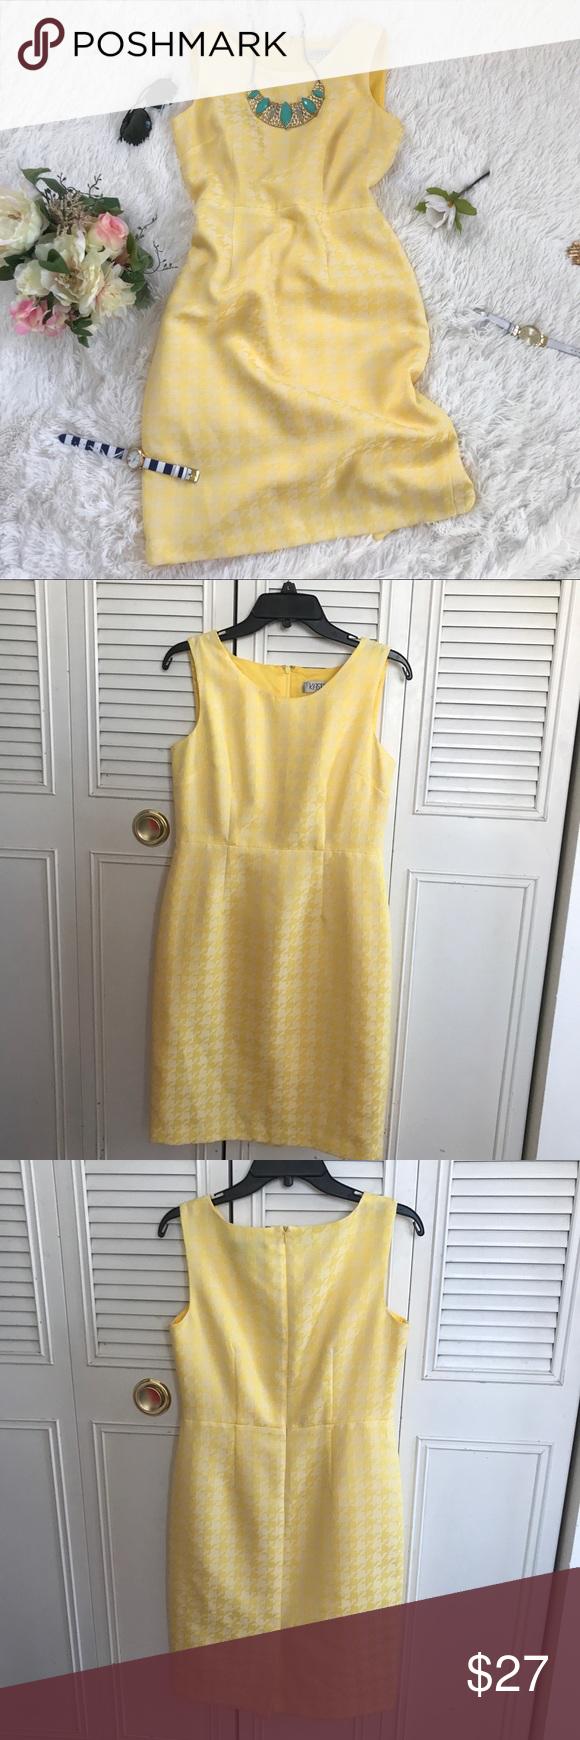 Yellow dress for women  Kasper Womenus sleeveless yellow dress  Yellow dress and Conditioning